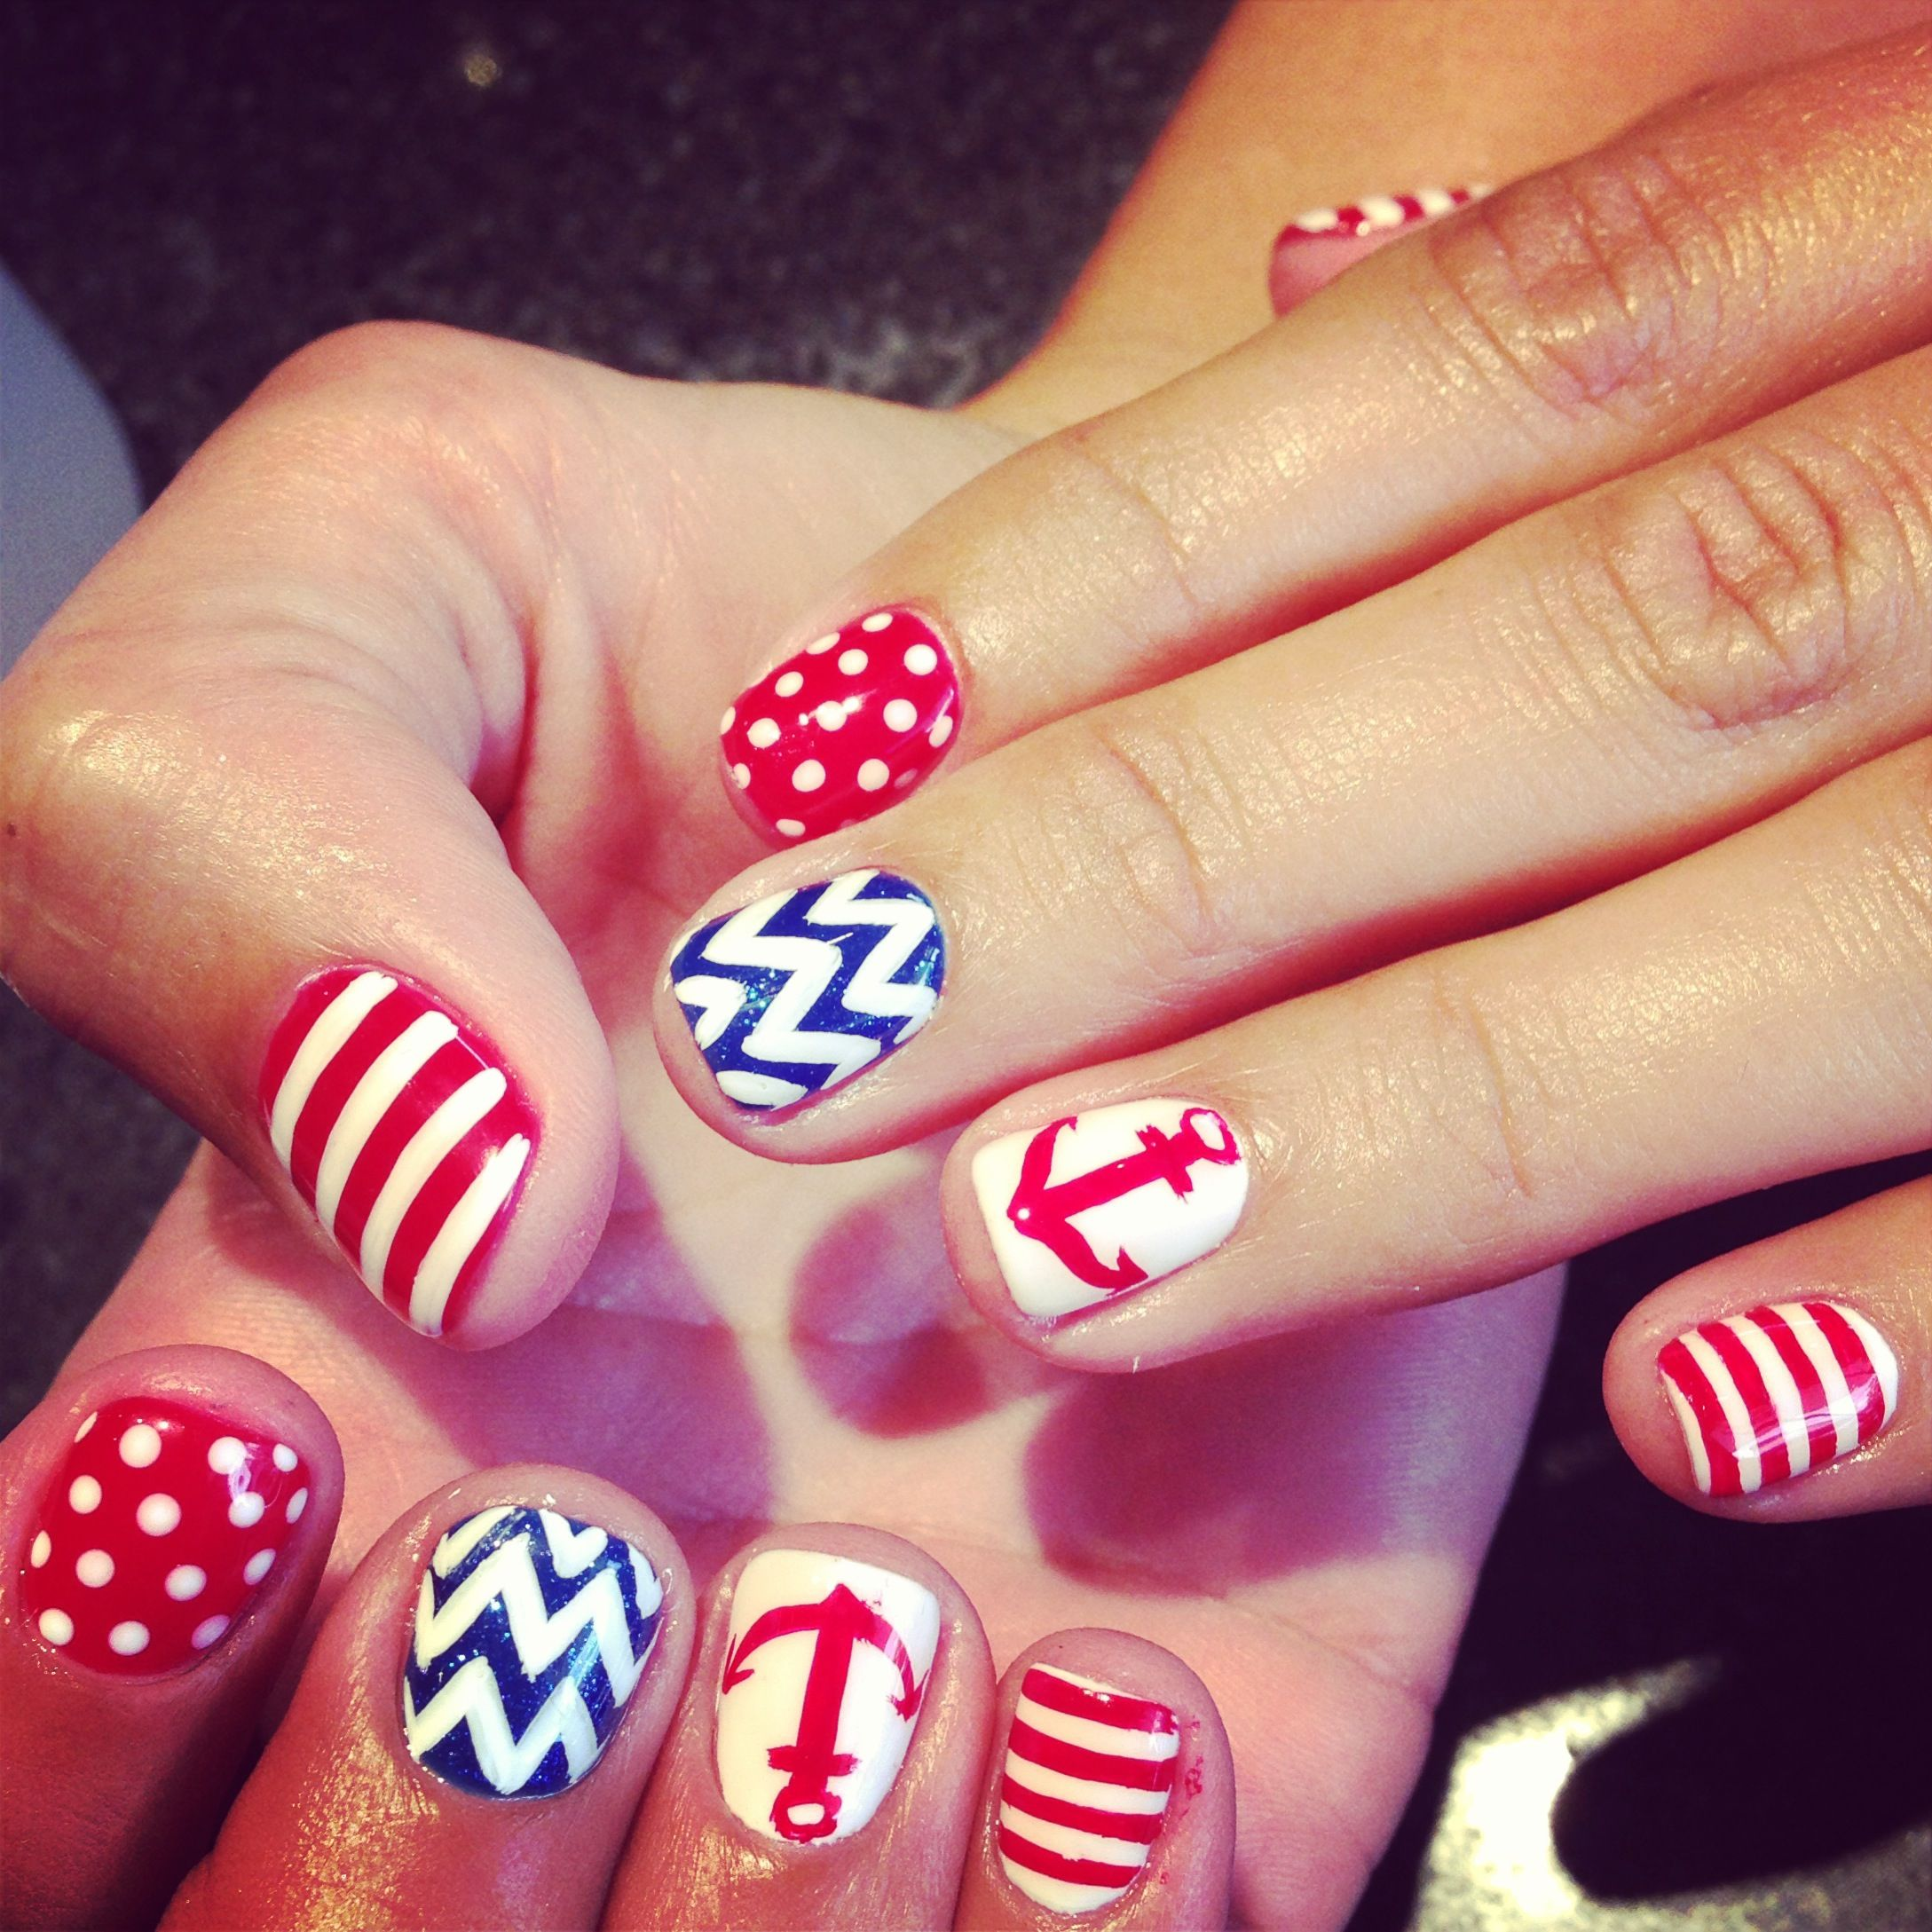 Shellac gel color nails with anchor, chevron , polka dot design ...